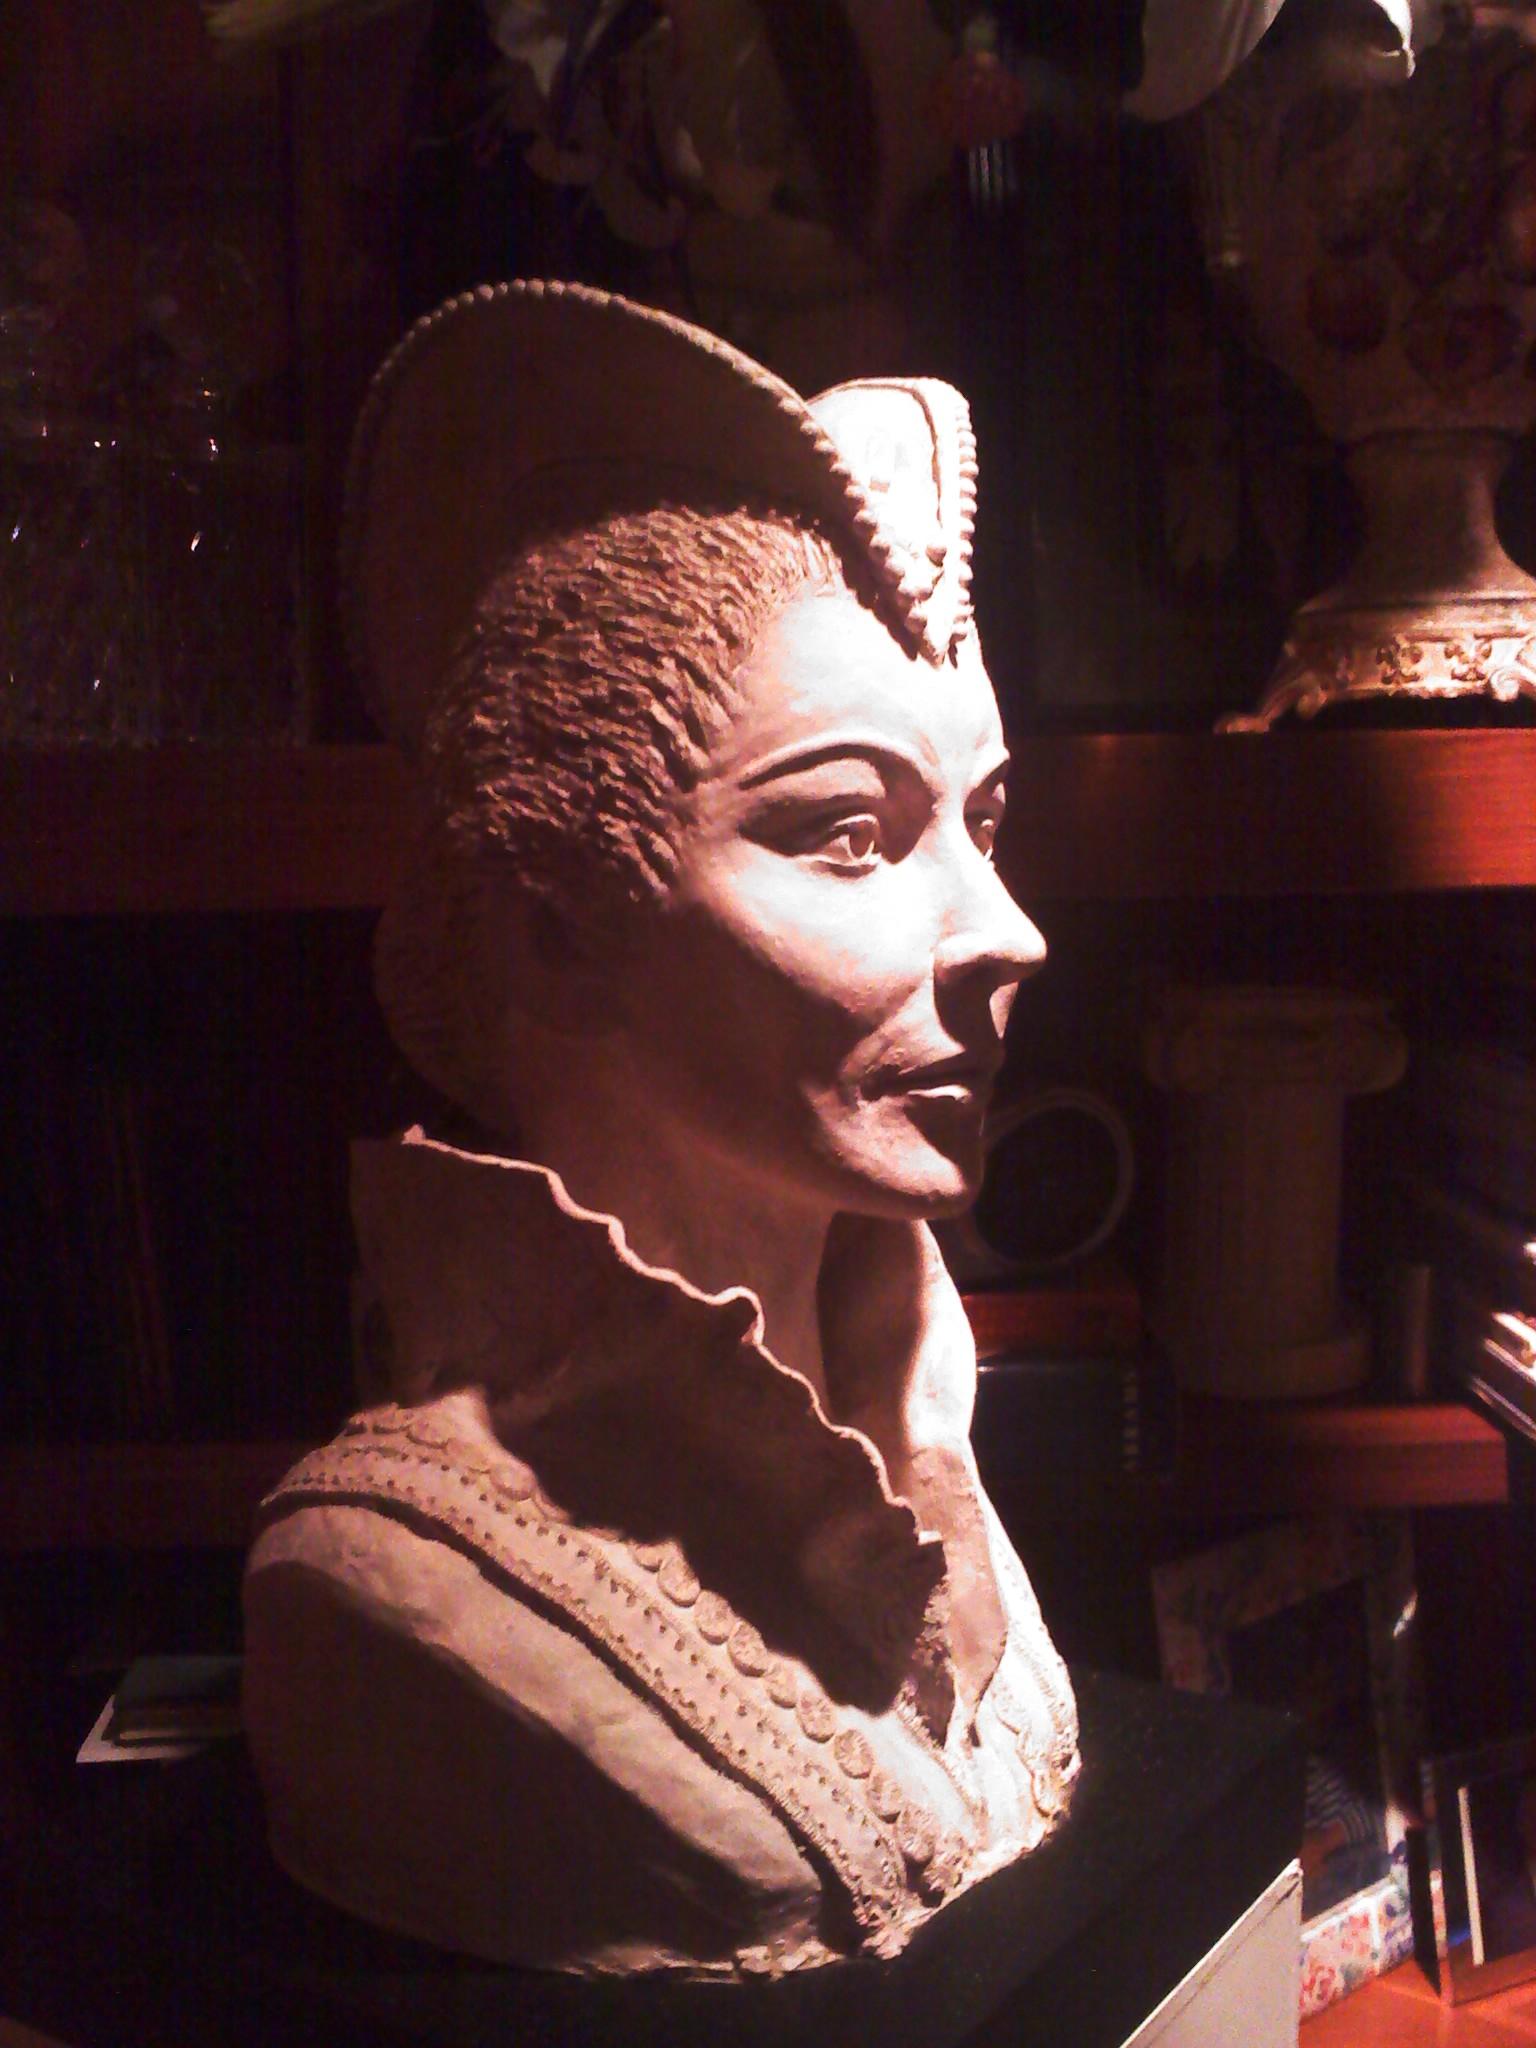 Bust of Maria Callas as Elisabetta in  Don Carlos  in OperaMetro's main hall